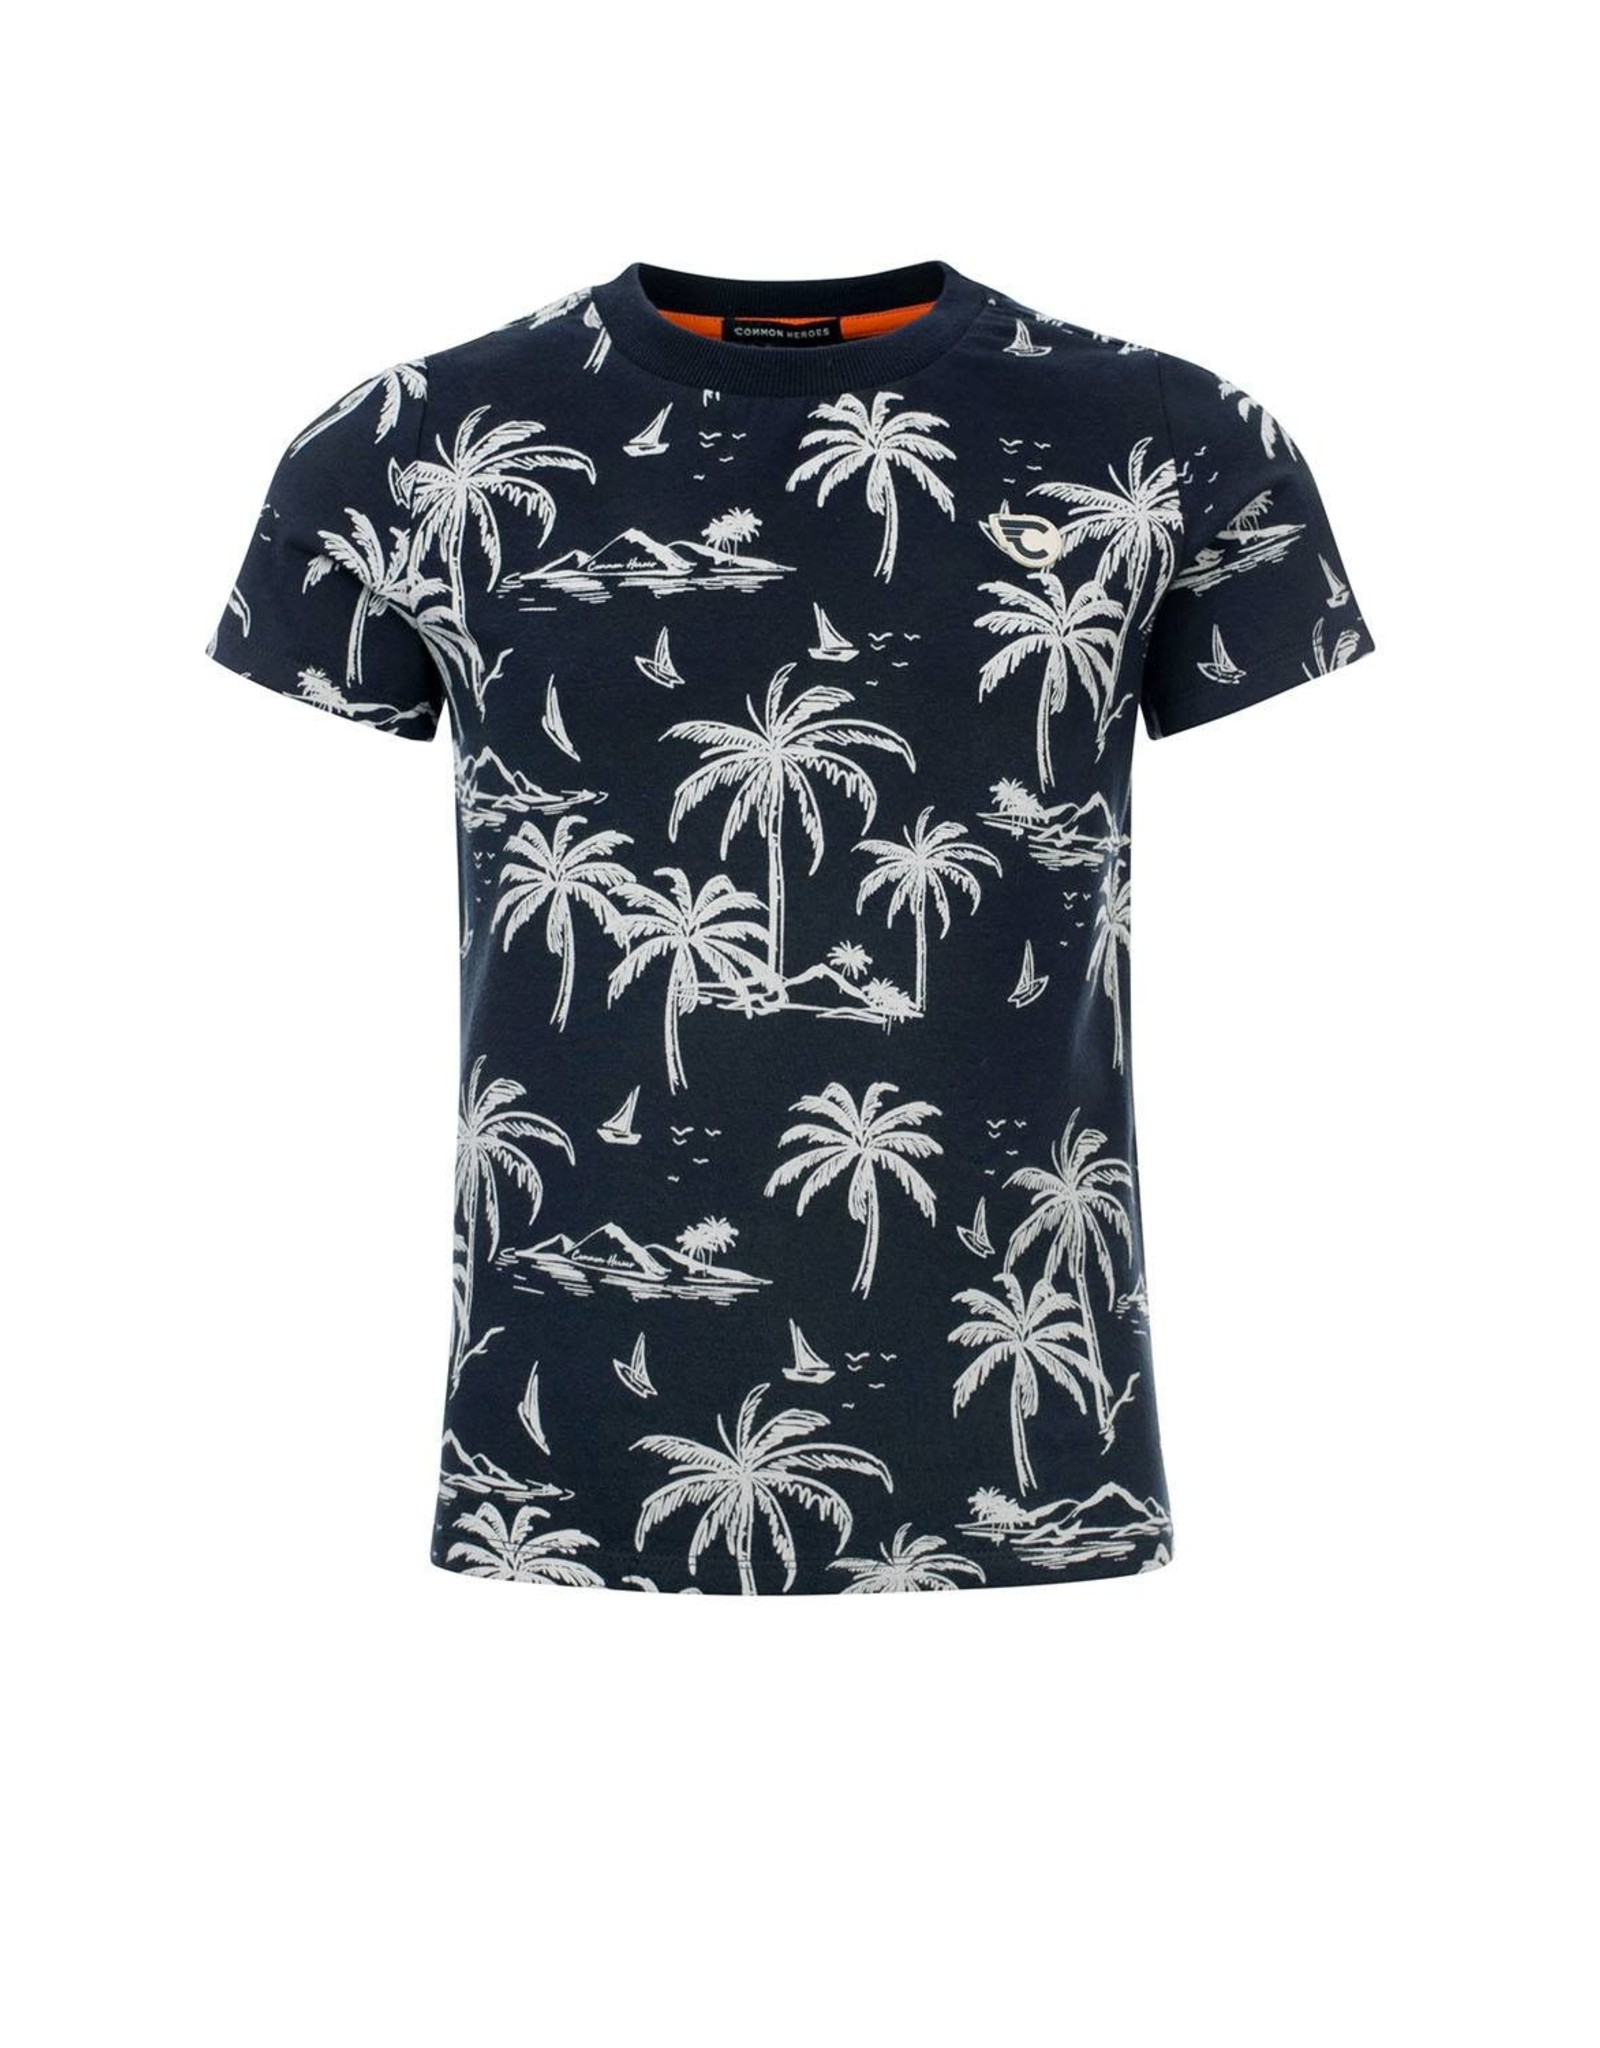 Common Heroes BINK T-shirt with lycra AO Island pr